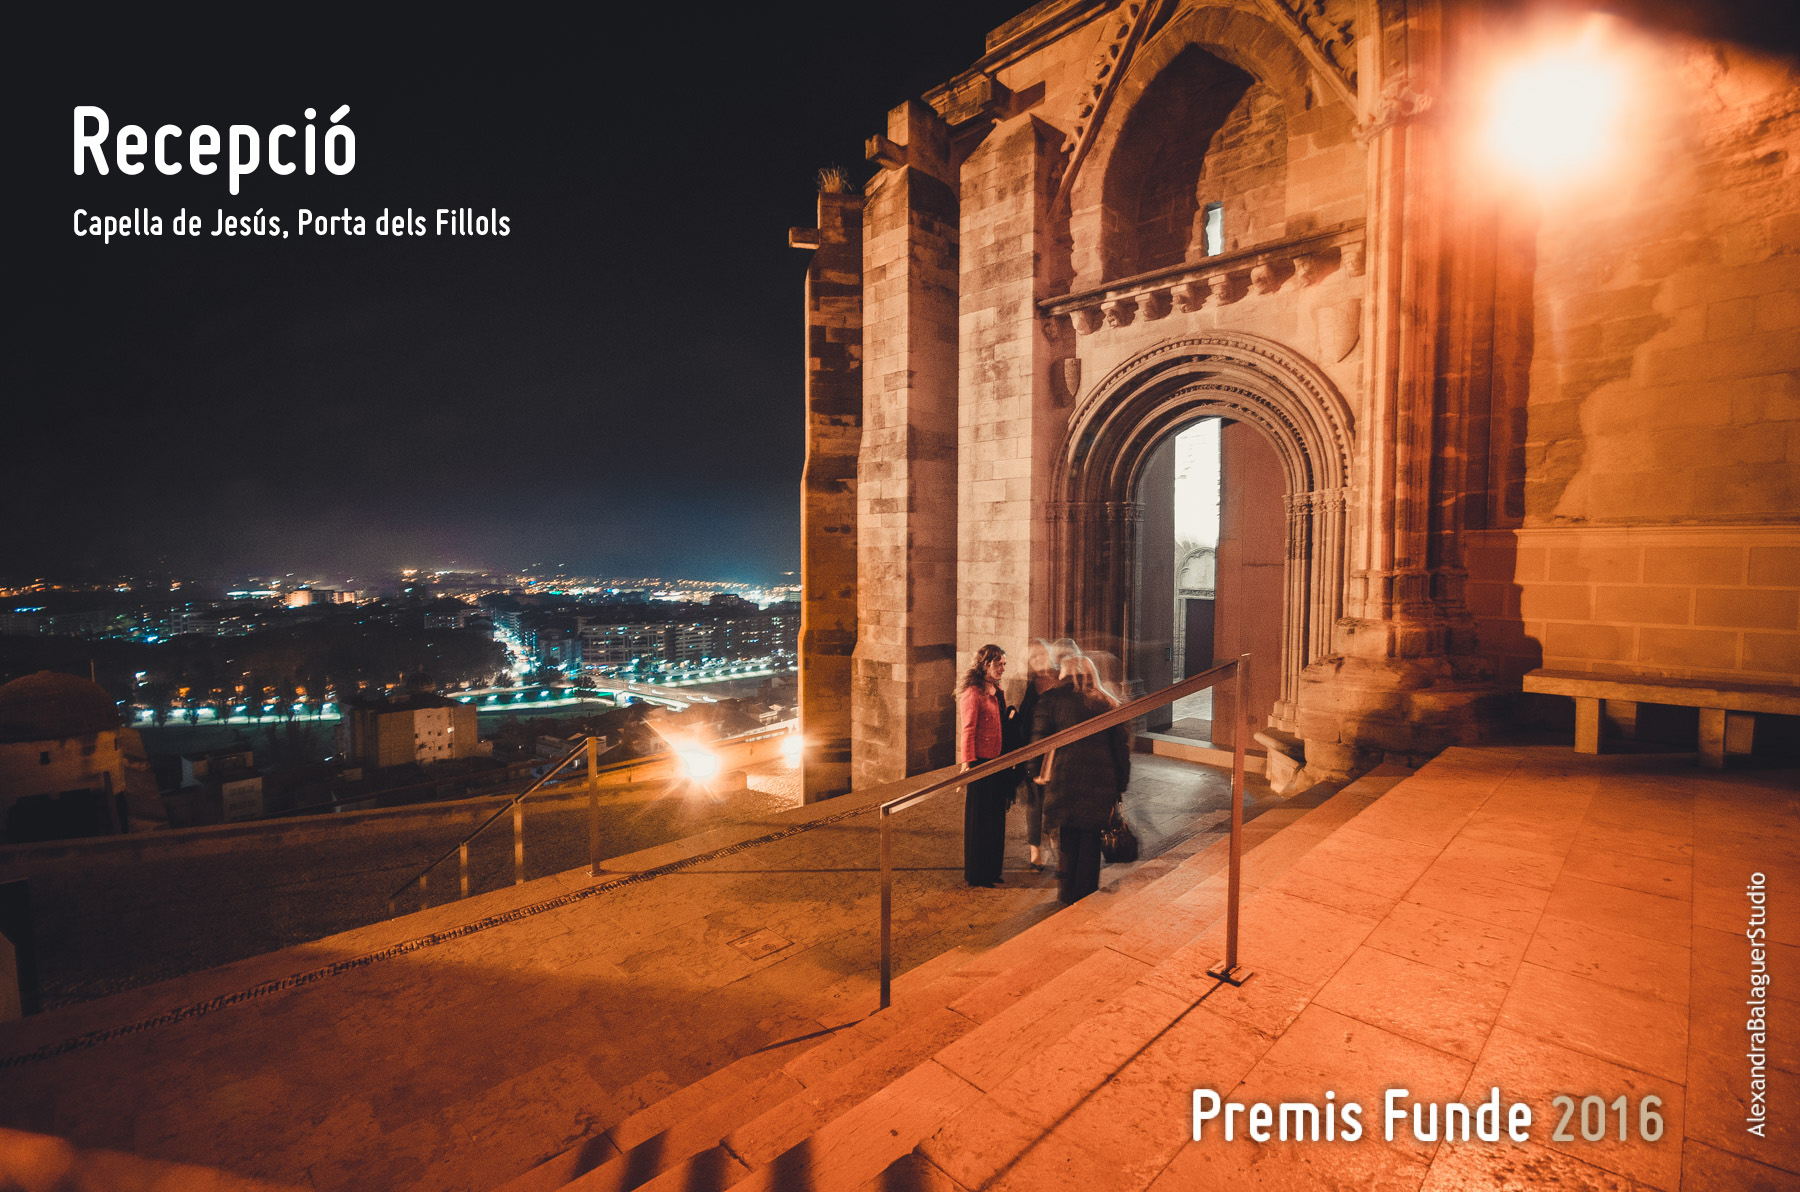 Premis Funde 2015